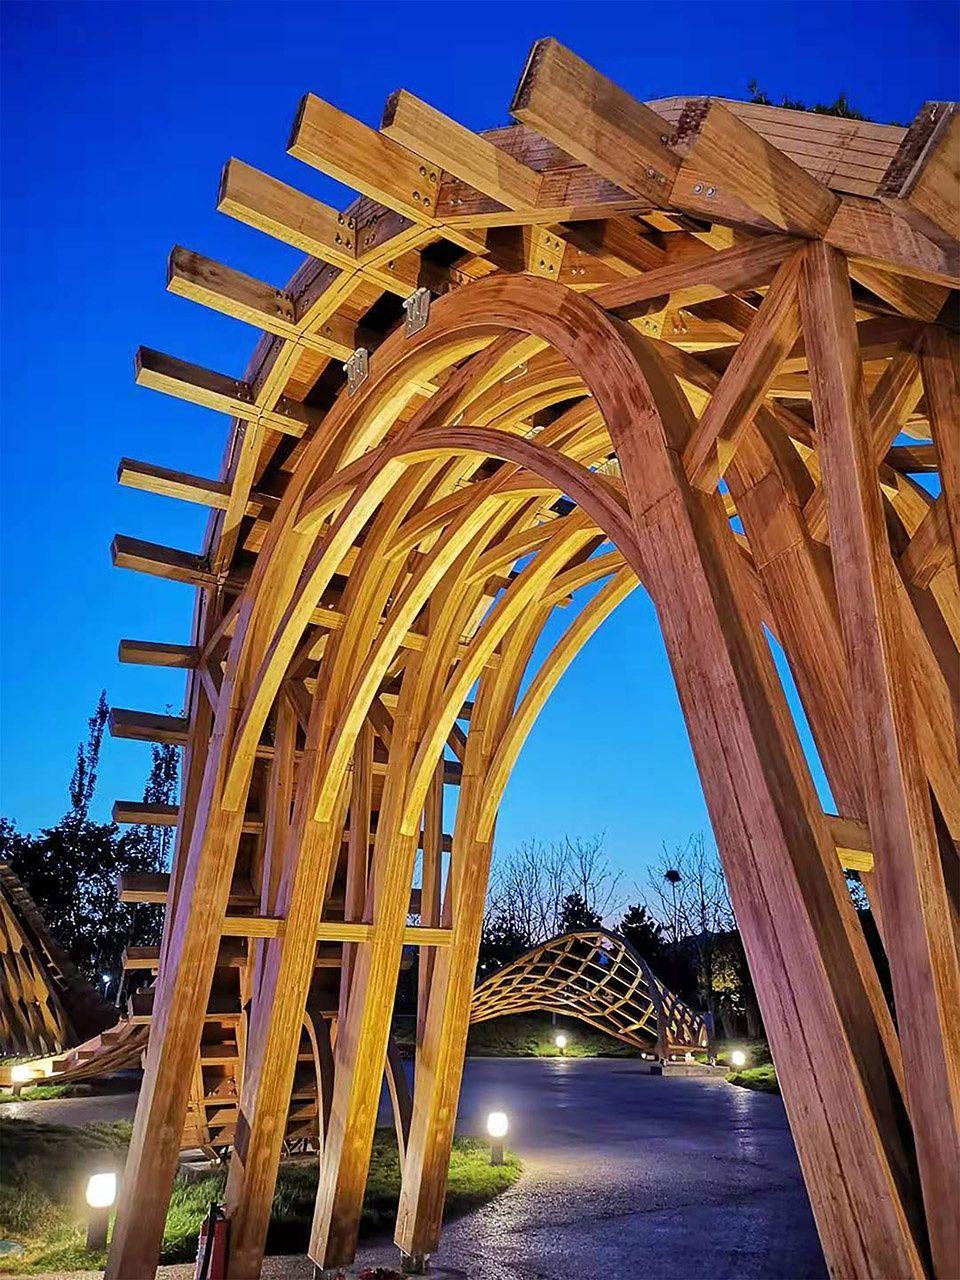 Design Of Qinsen Enterprise Exhibition Garden For 2019 Beijing World Horticultural Exposition In 2020 Exhibition World Design Research